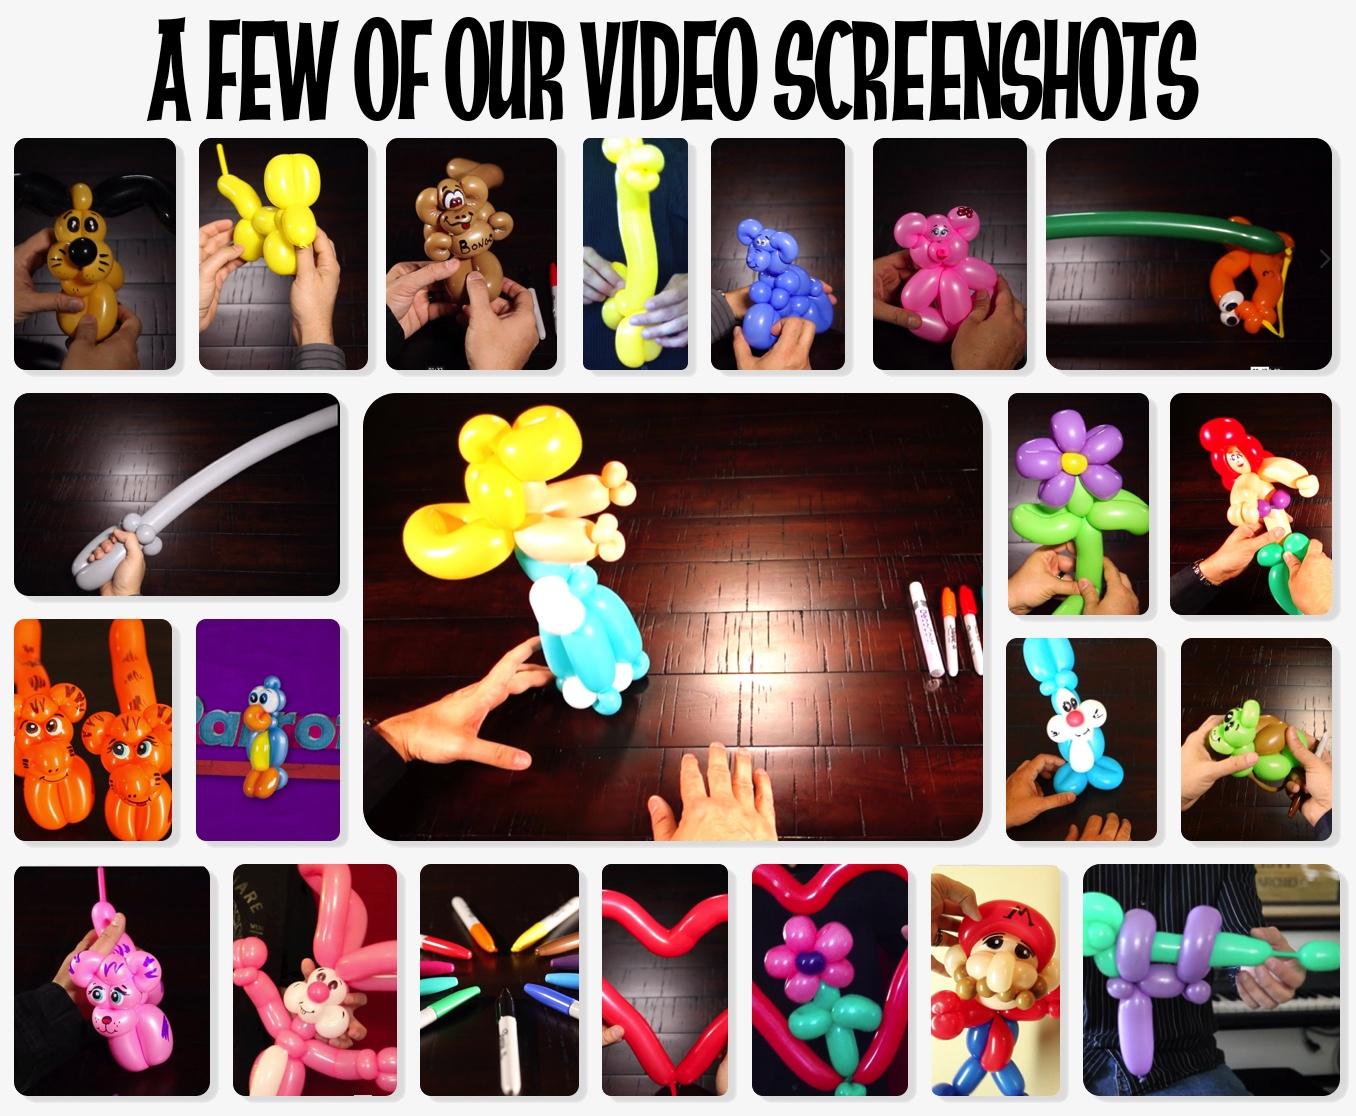 video screenshots.jpg